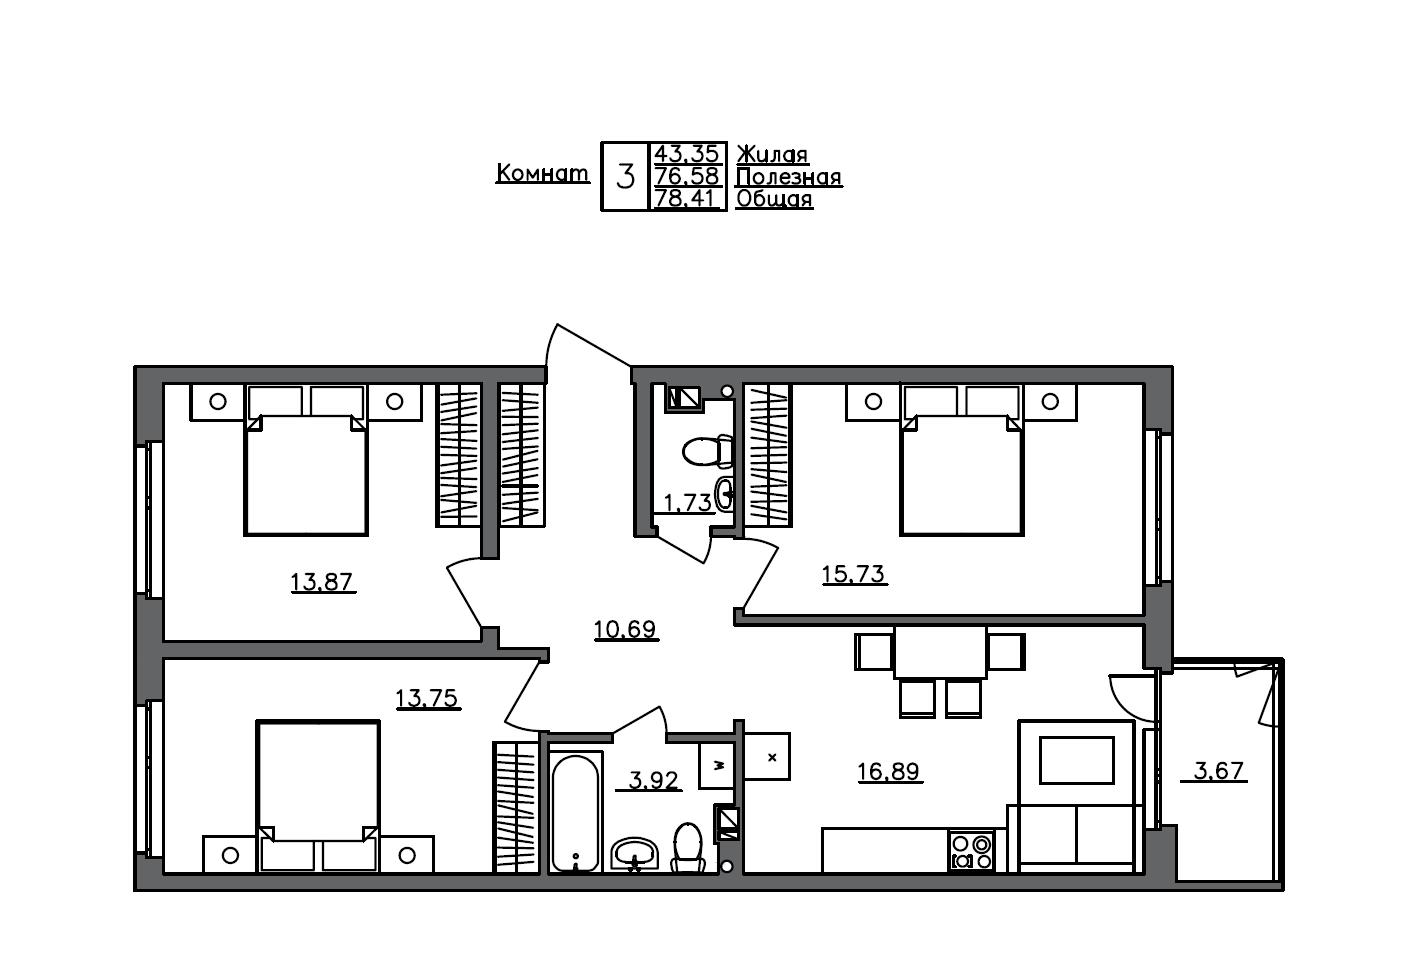 4Е-к.кв, 78.41 м²